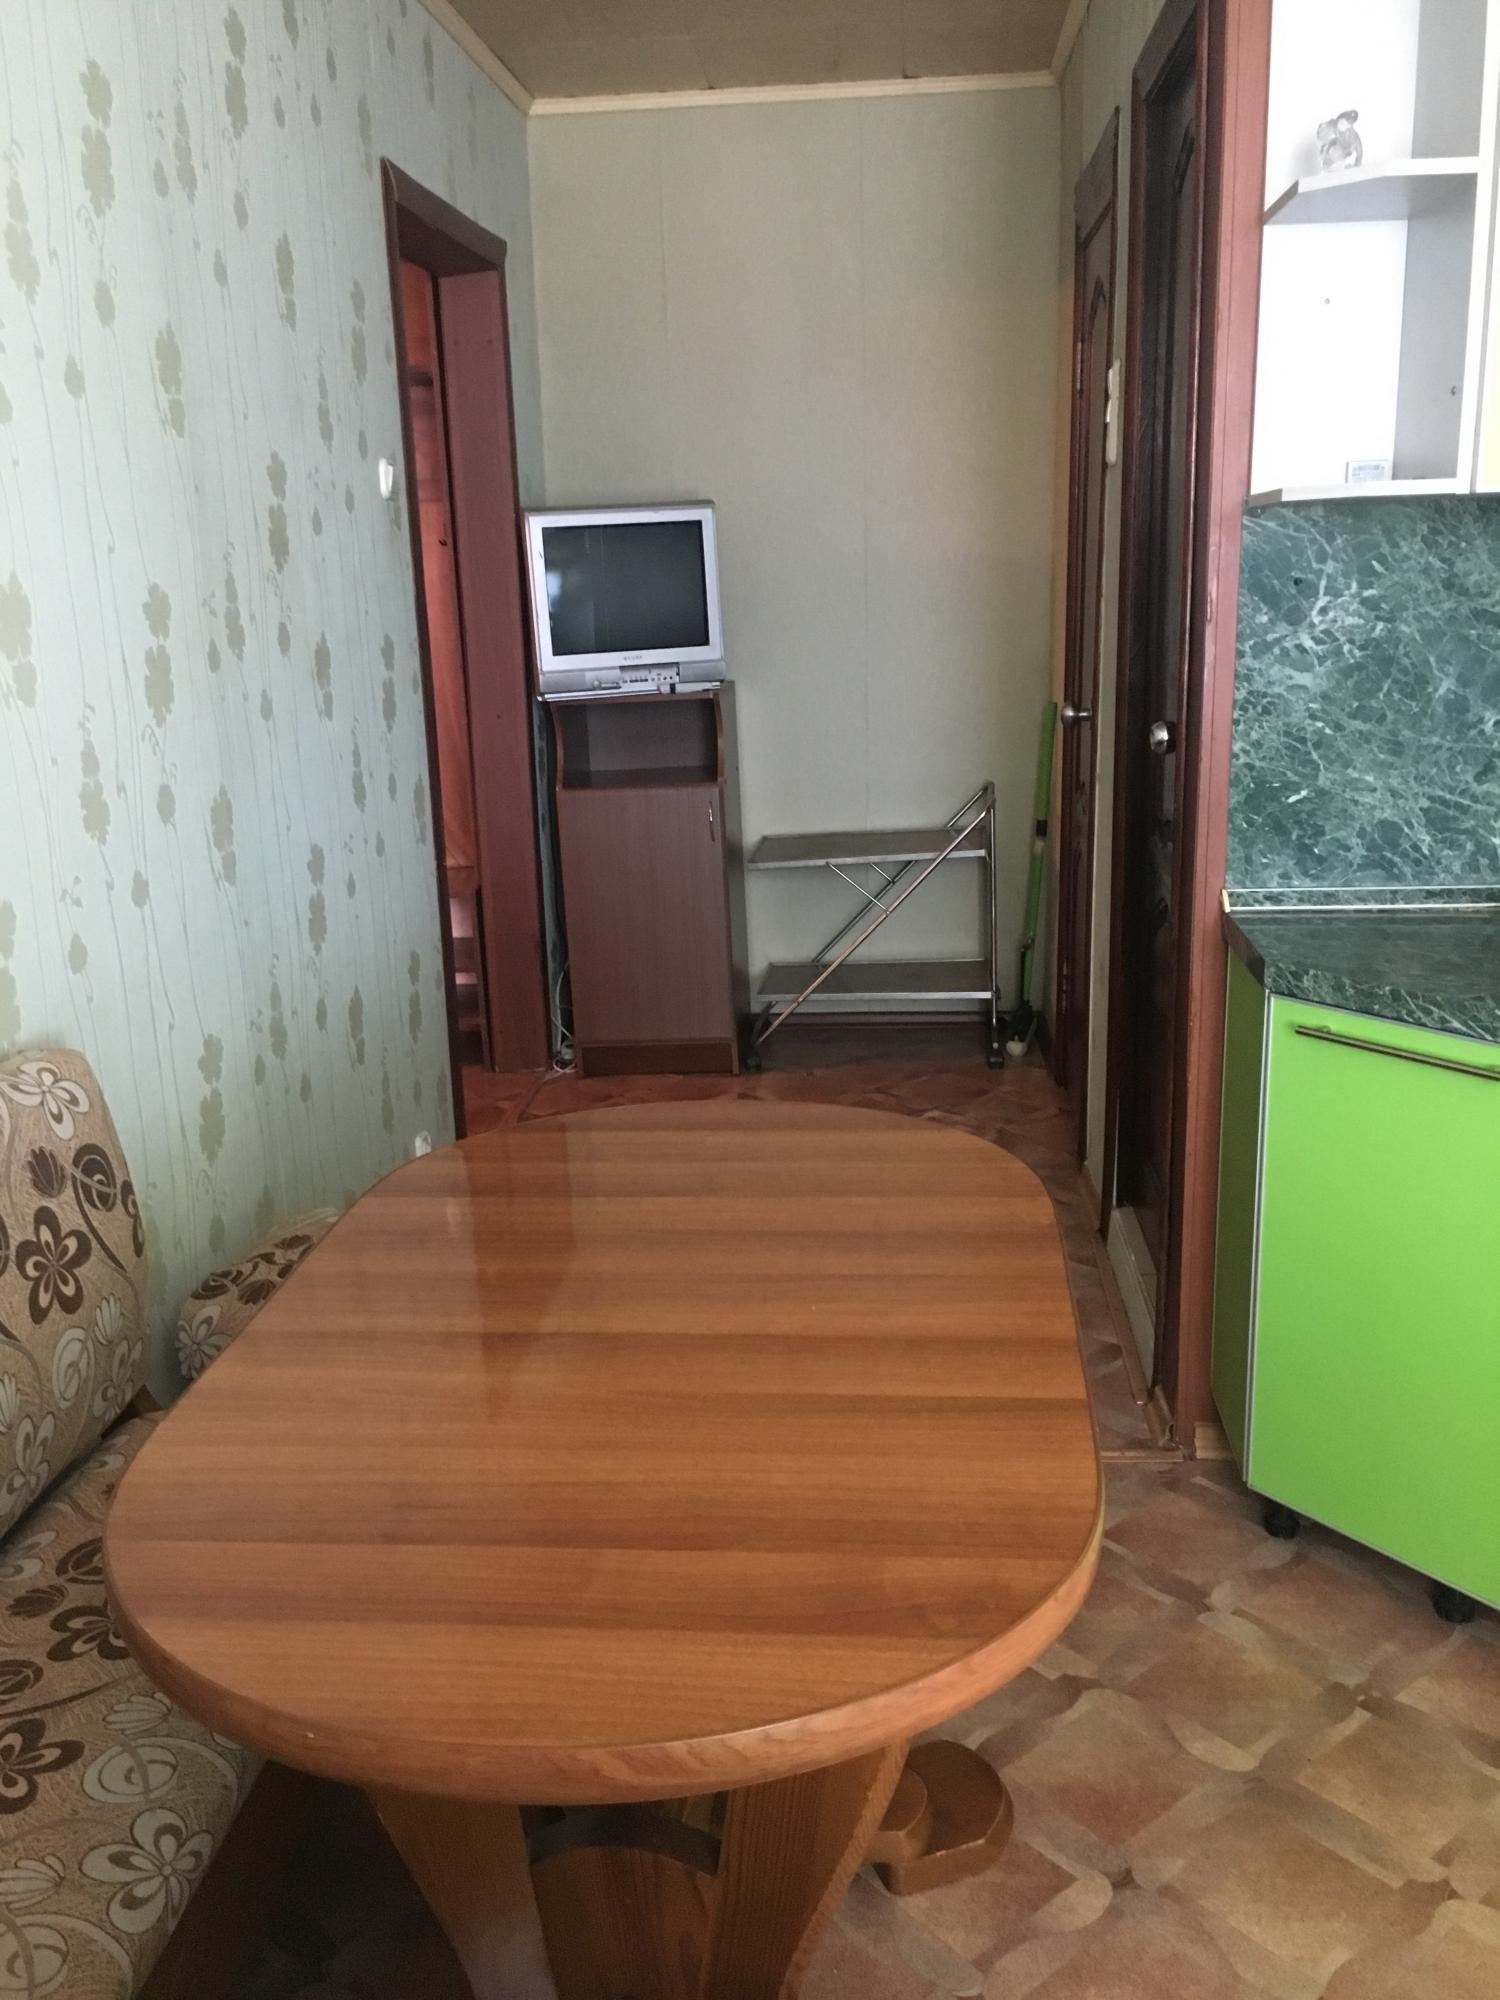 Аренда 2-комнатной квартиры, г. Тольятти, Толстого улица  дом 20